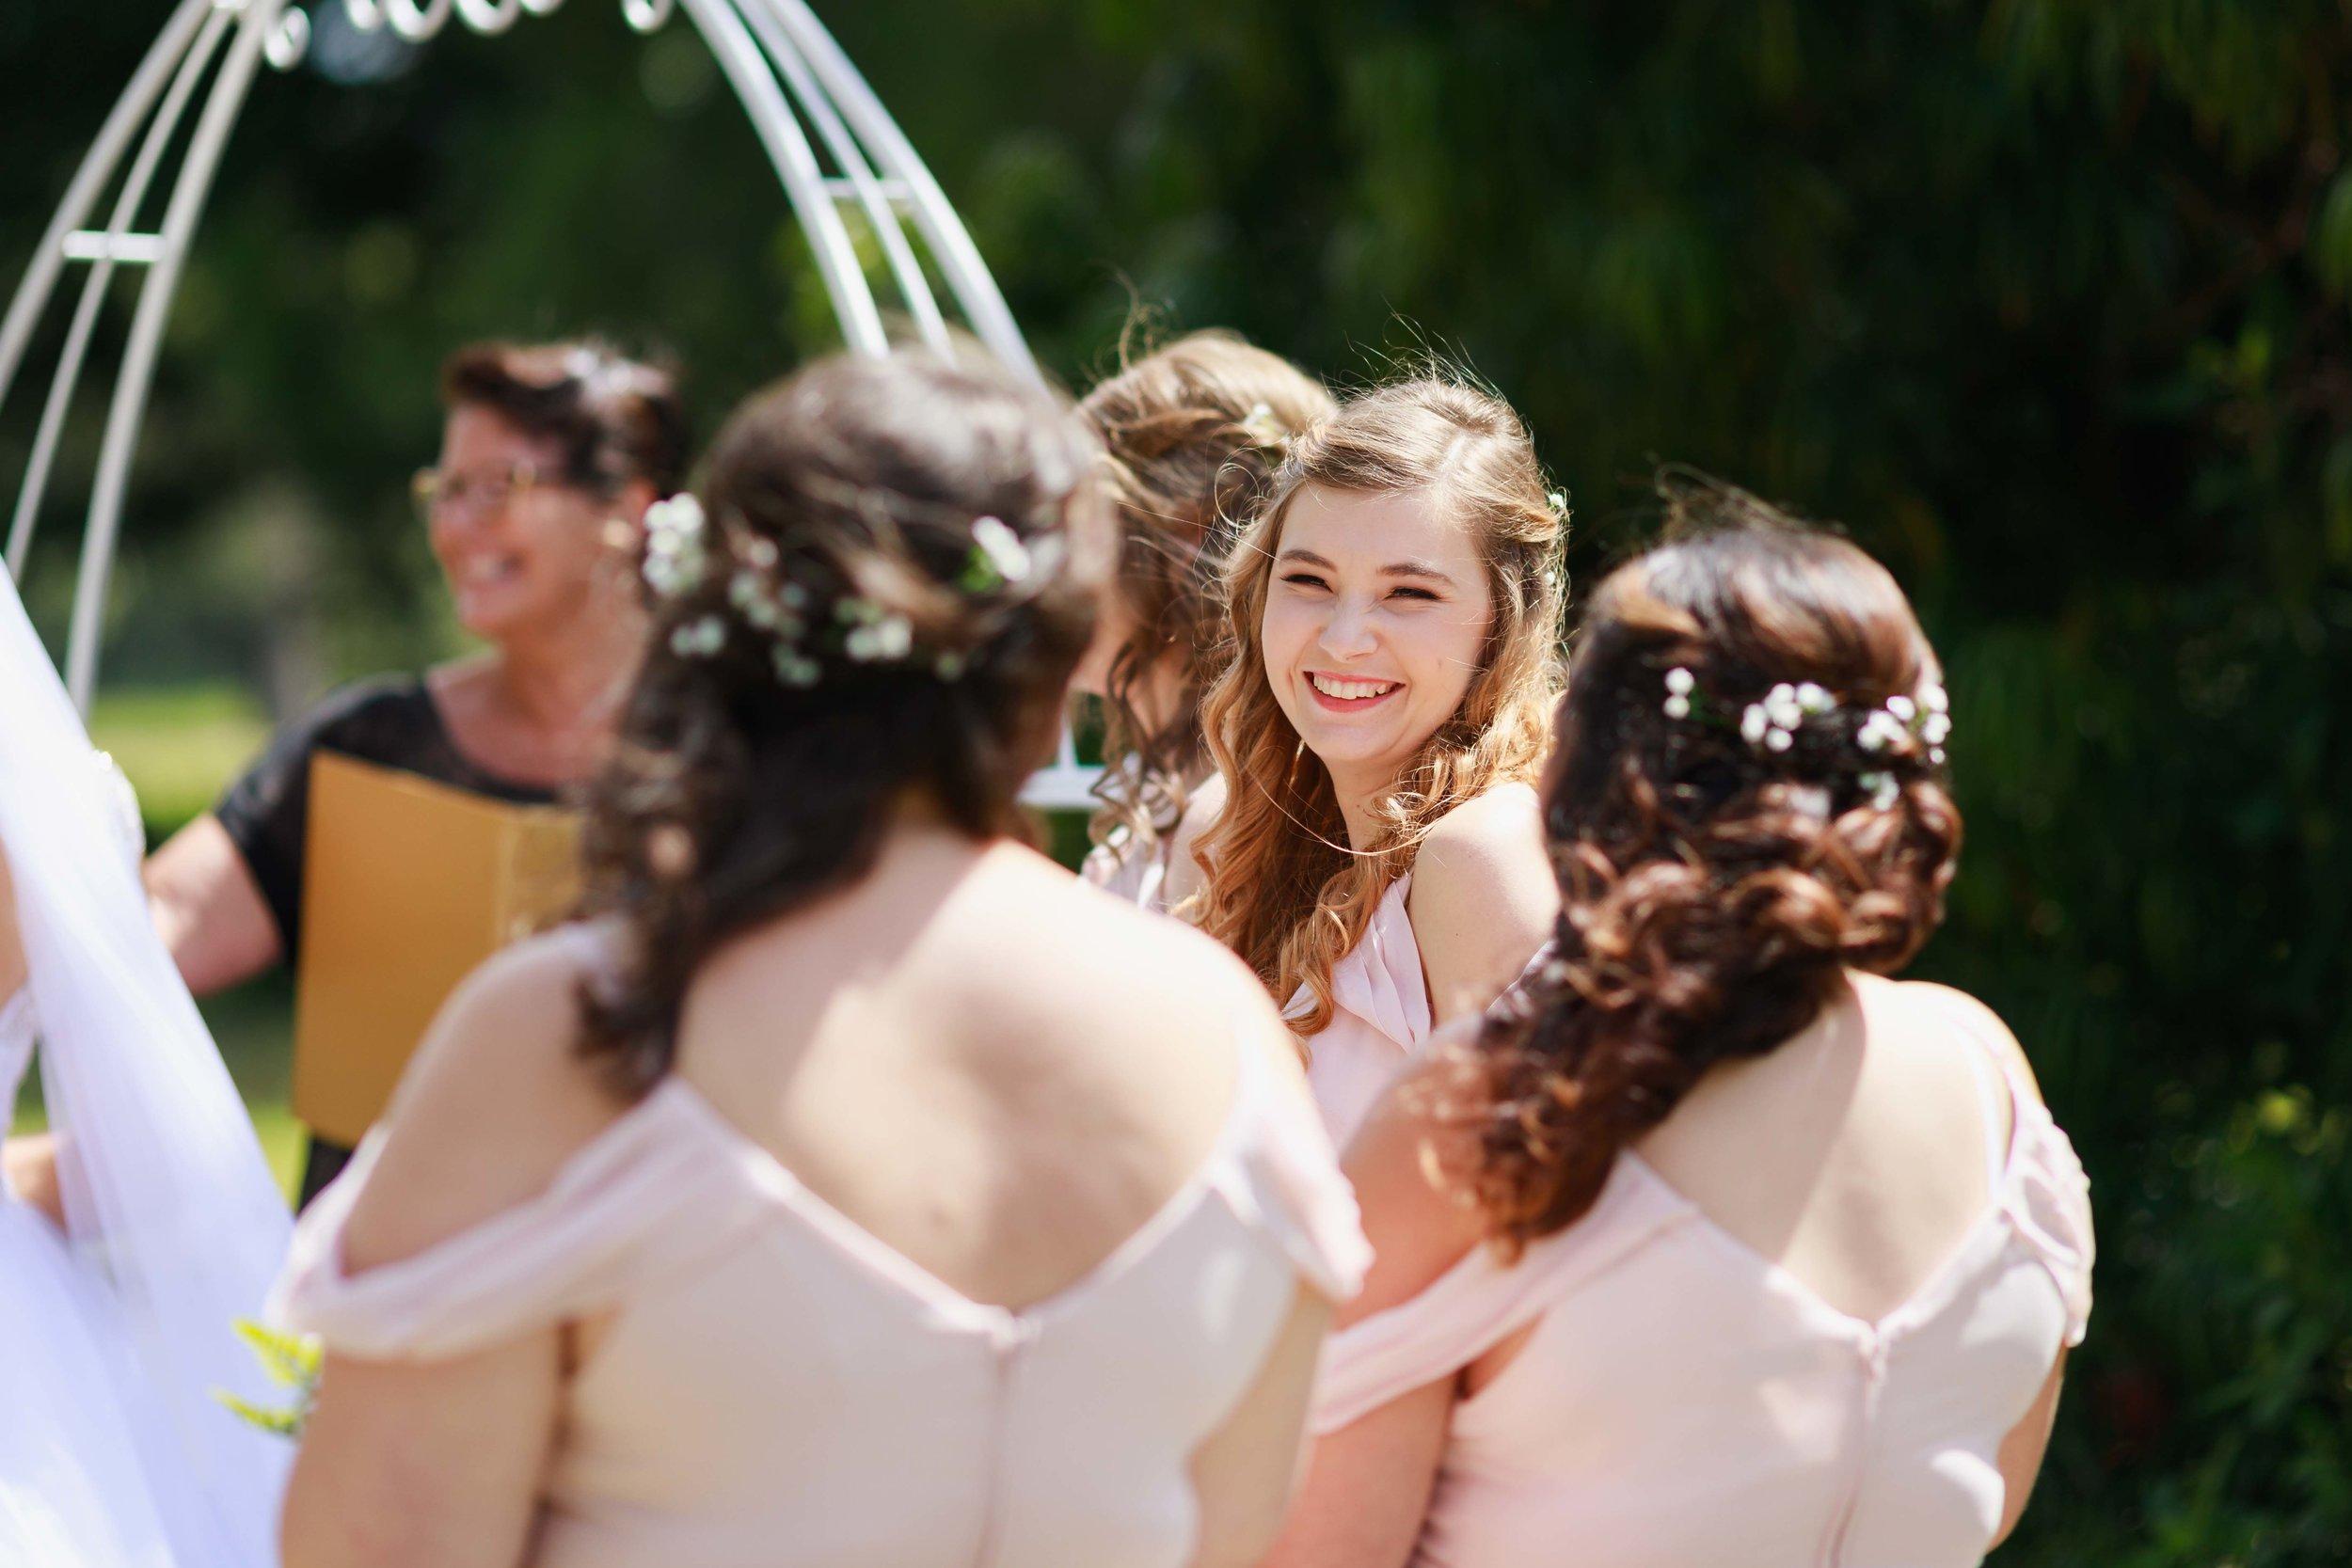 the-chalet-highlight-wedding-photography-palmerston-north-66.jpg